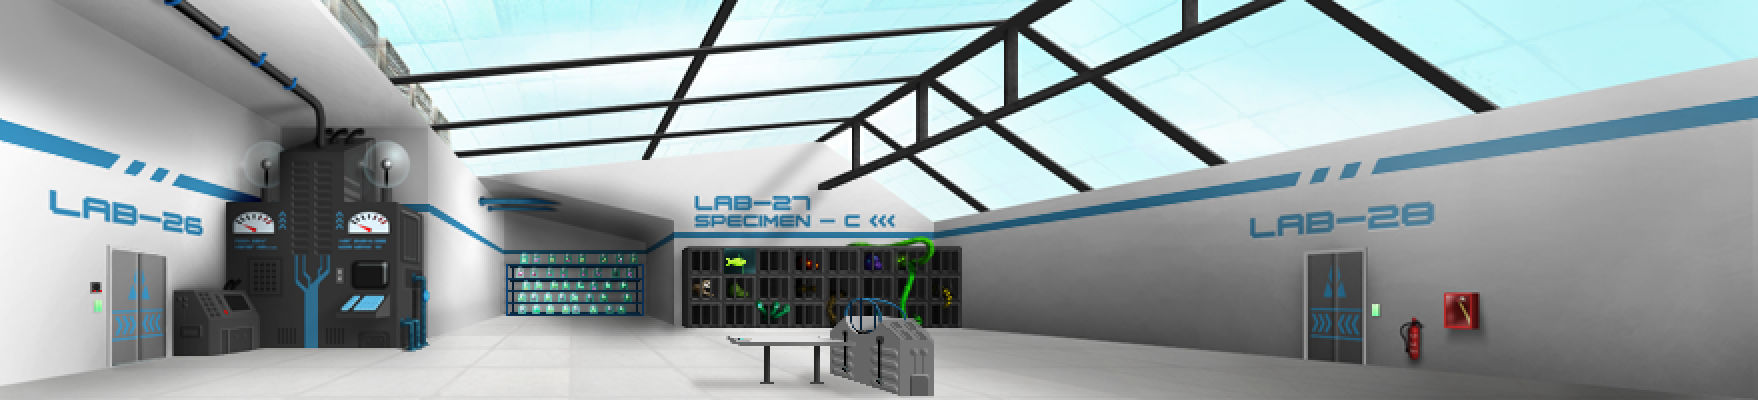 Laboratory 27